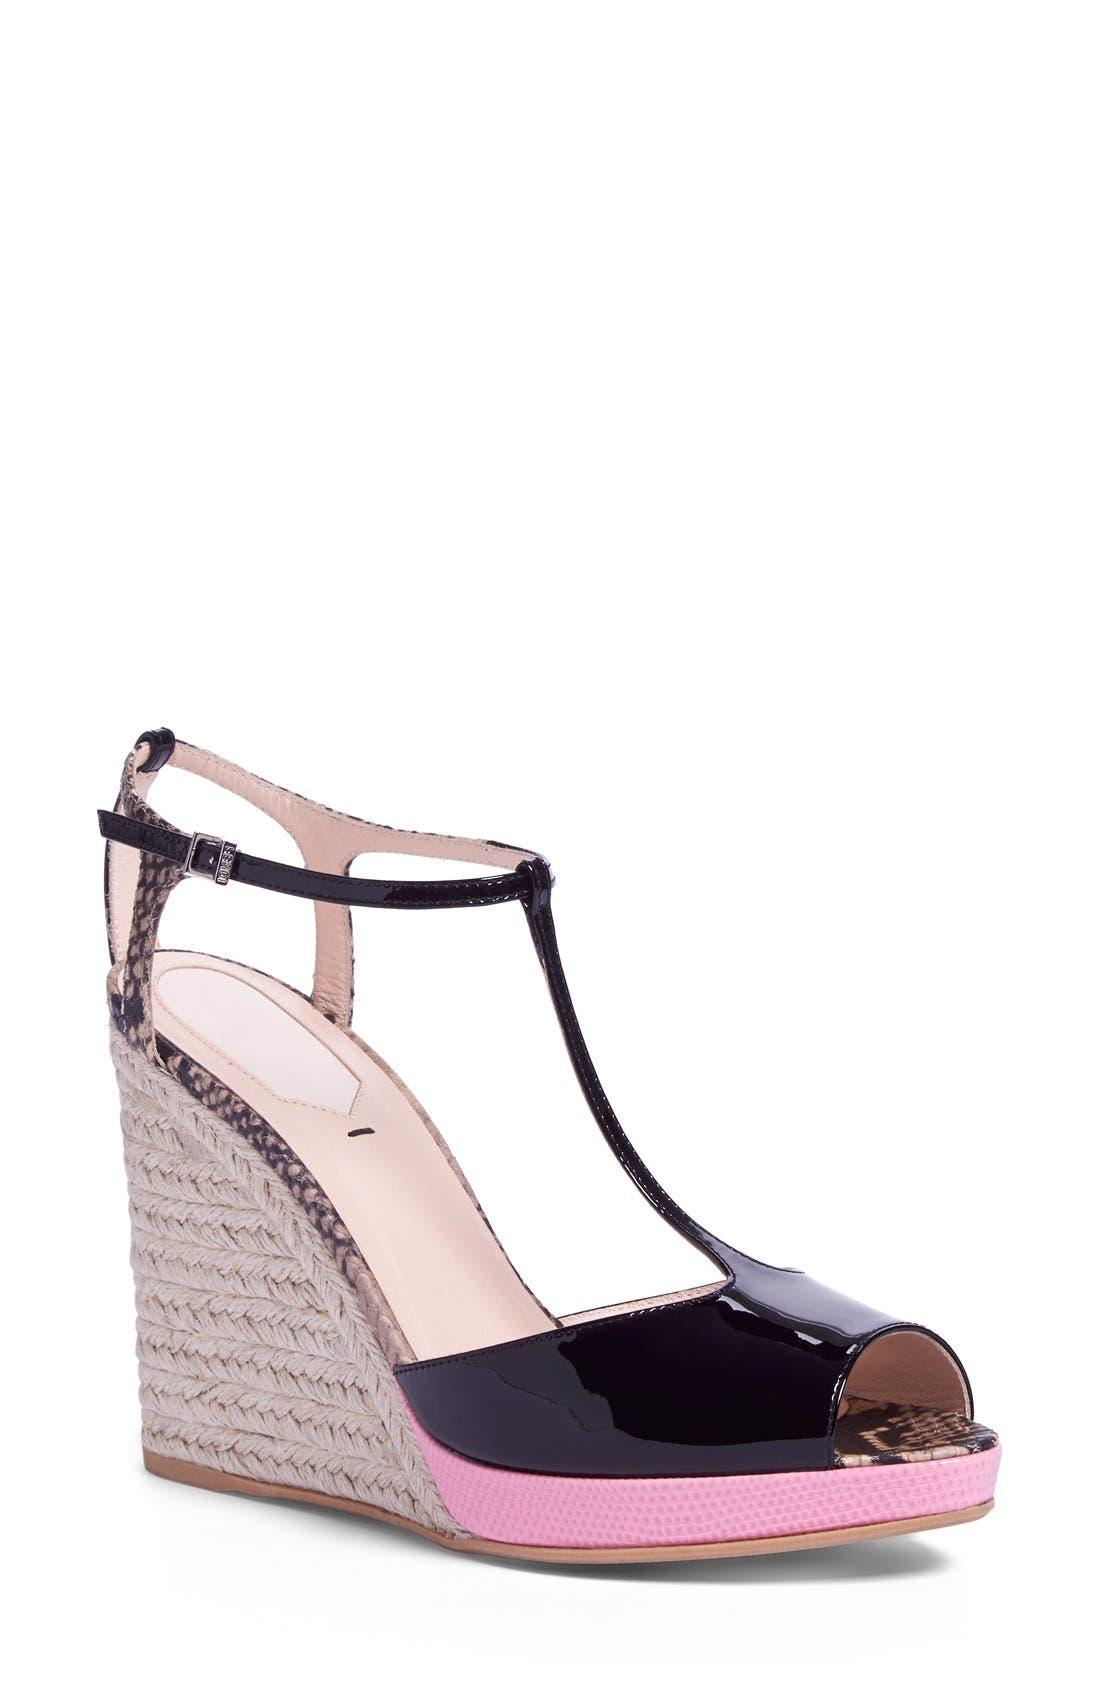 'Elodie' T-Strap Wedge Sandal,                             Main thumbnail 1, color,                             Black/ Pink Patent